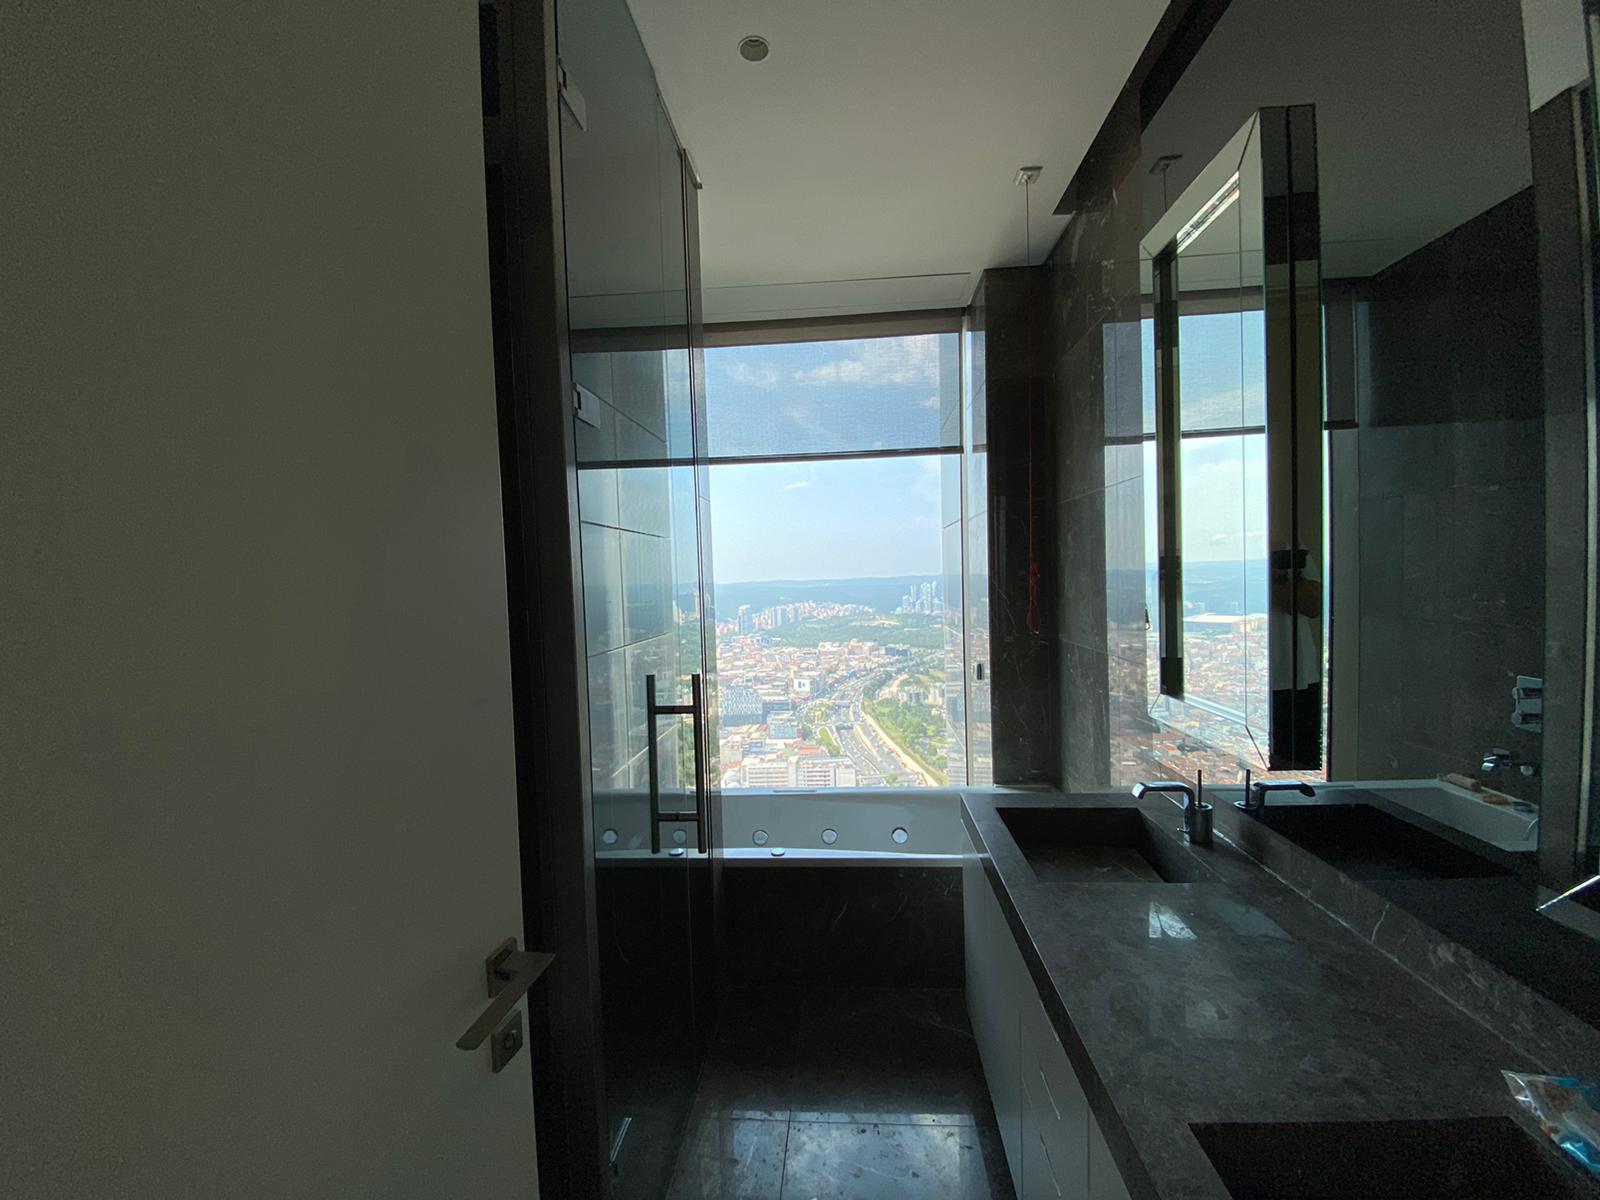 penthouse-istanbul-sapphire-tower-006-1.jpg